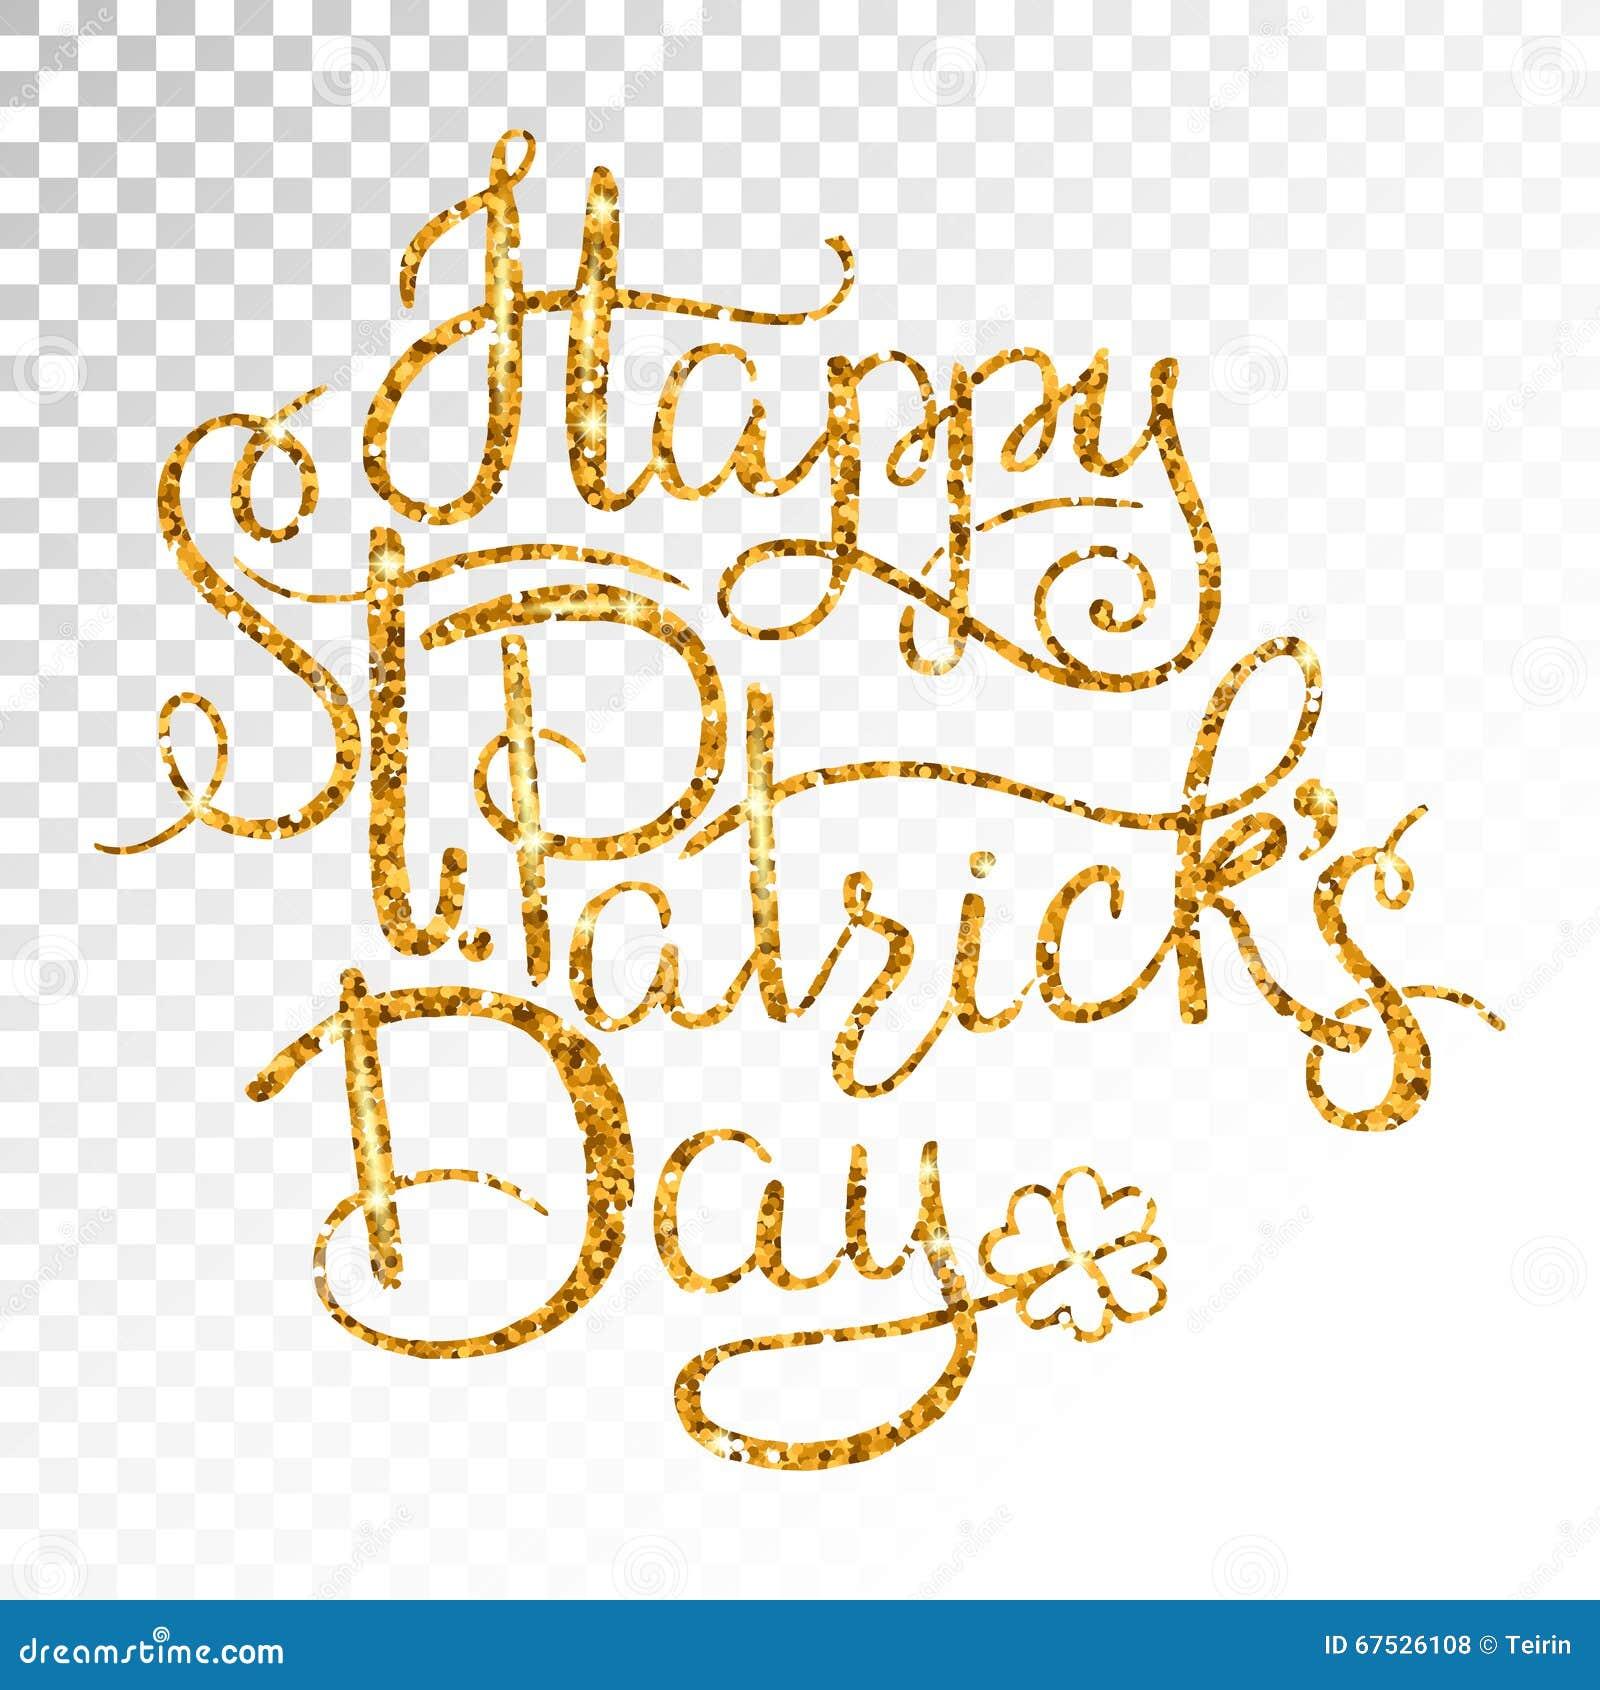 St Patricks Day Greetings Stock Vector Illustration Of Irish